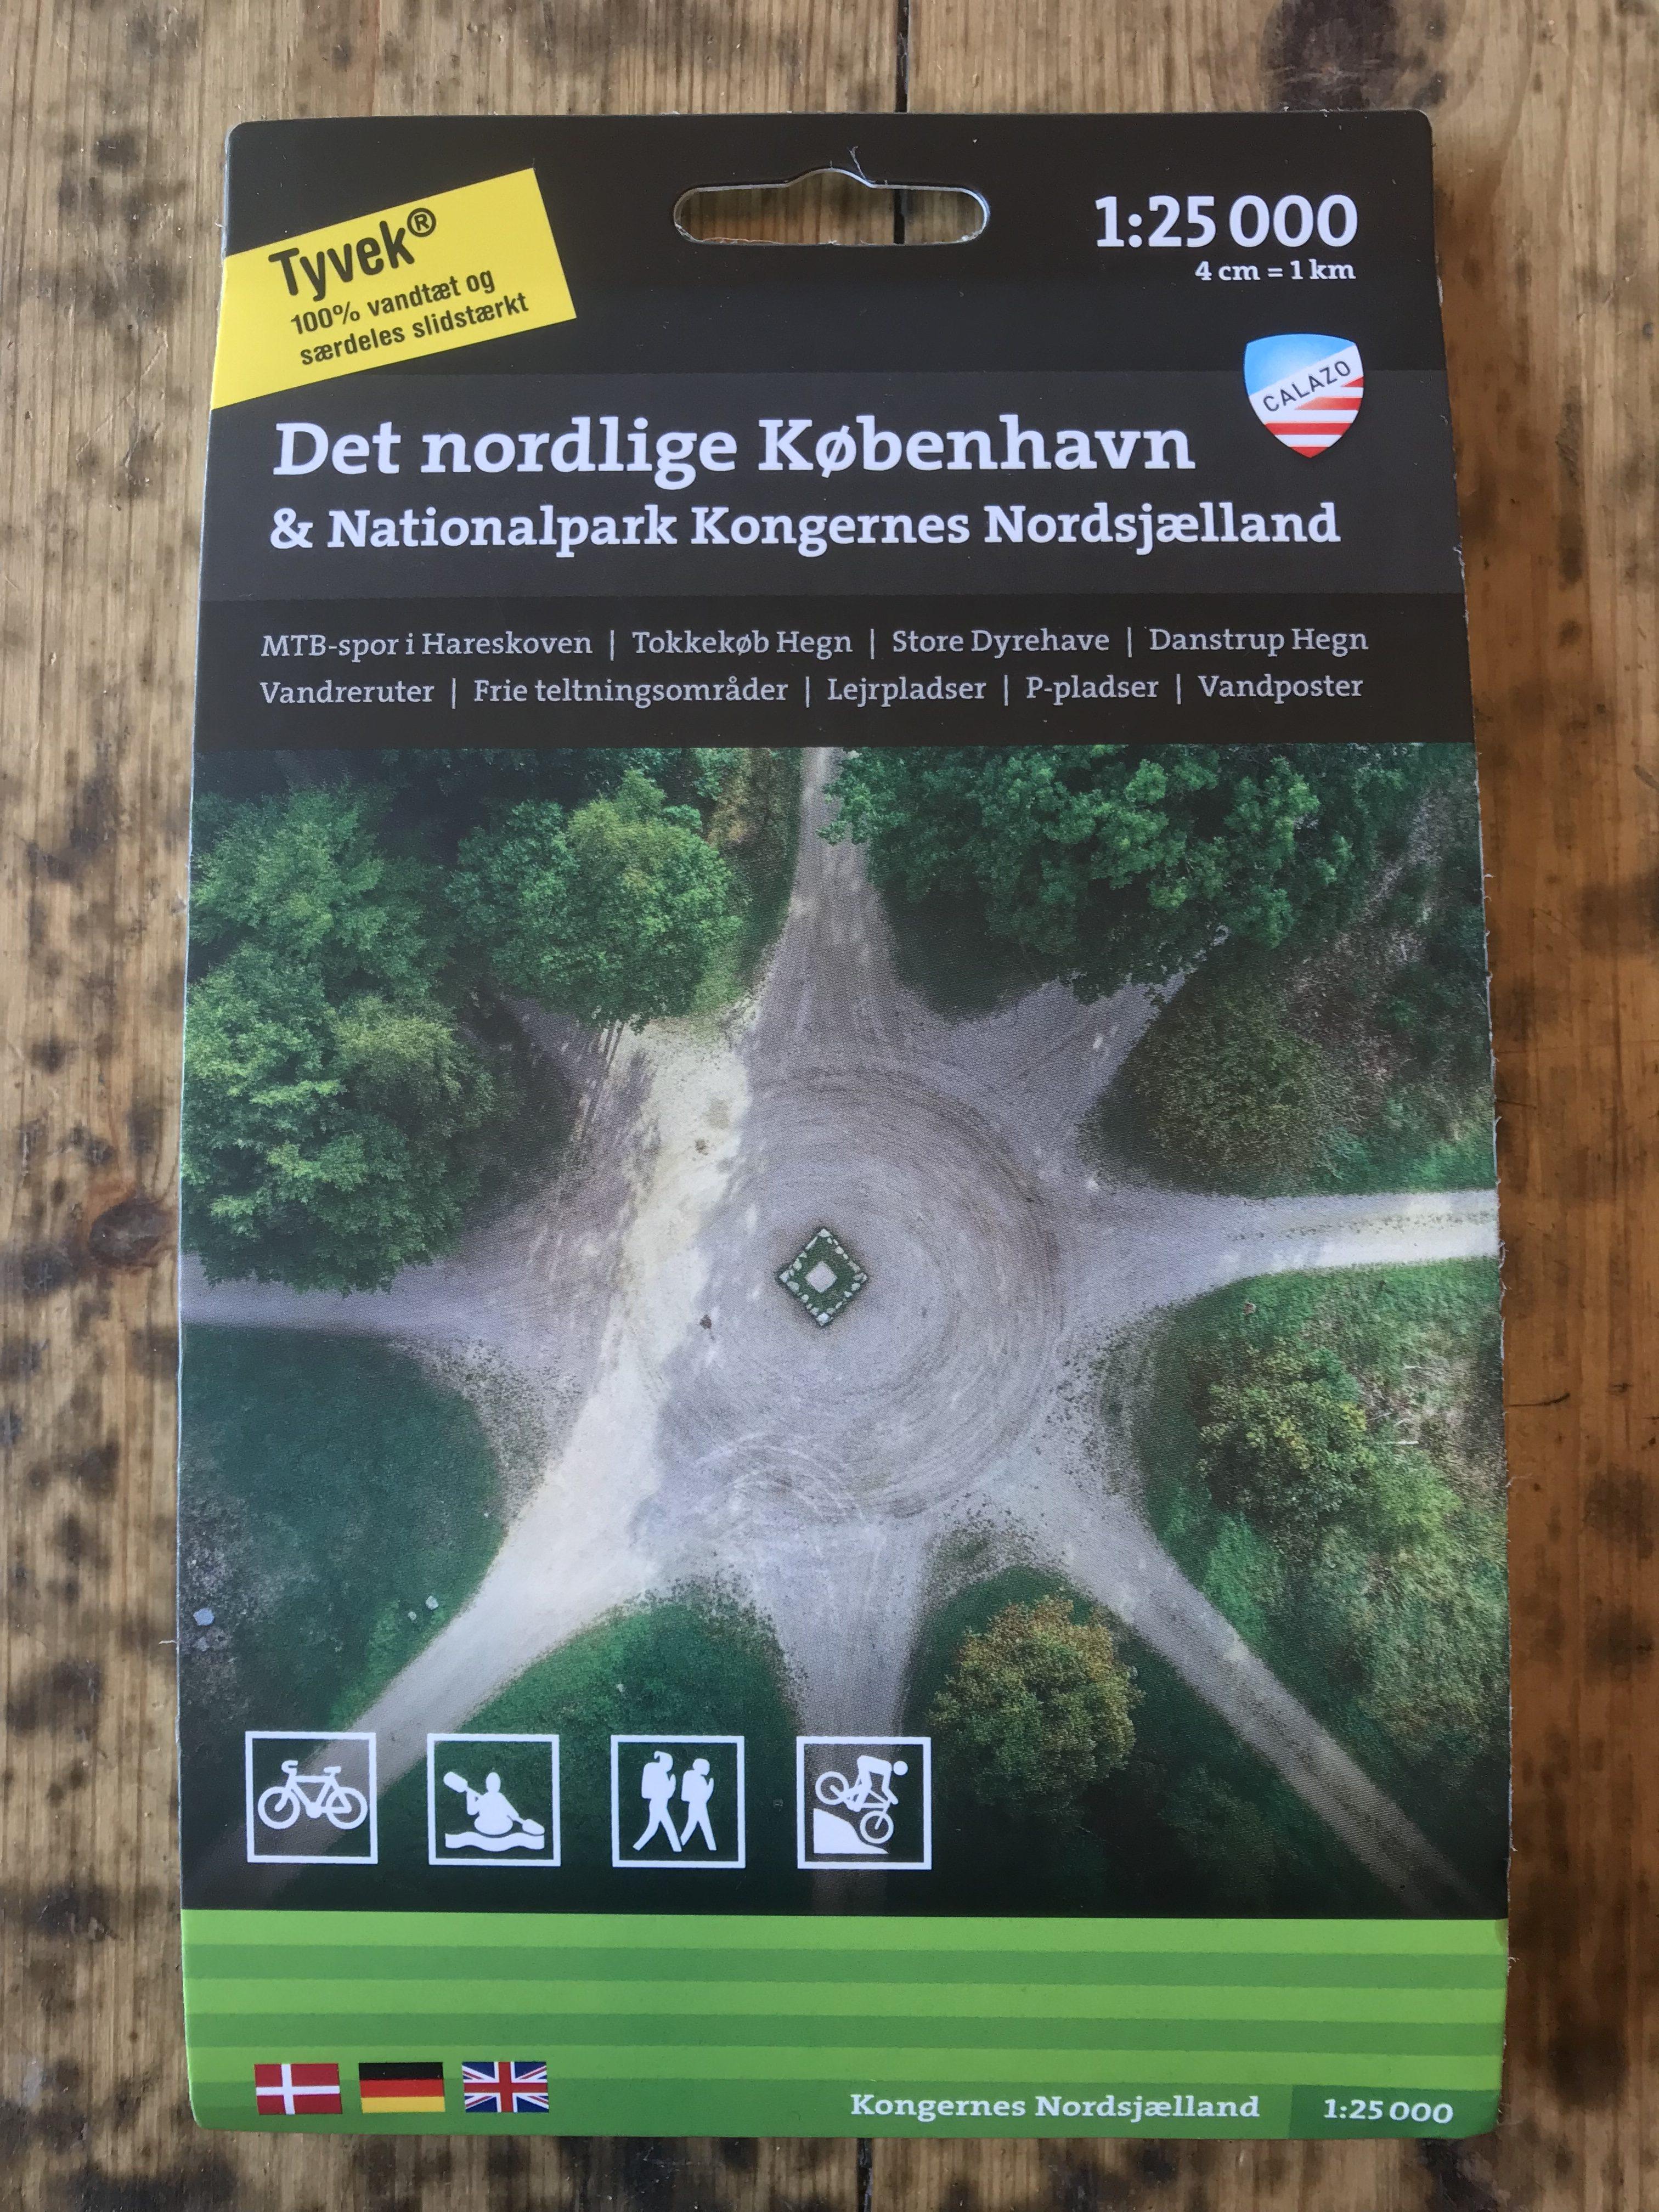 Calazo kort over Nordsjælland